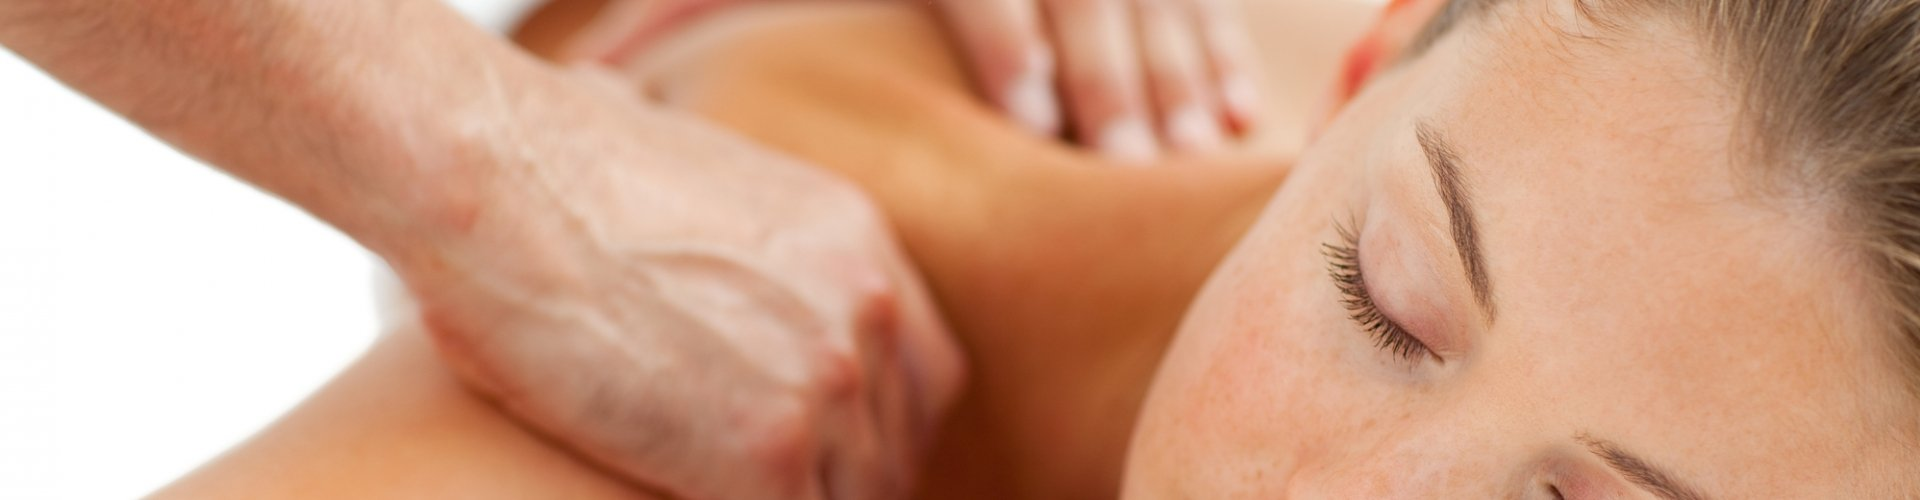 ats massage cursussen